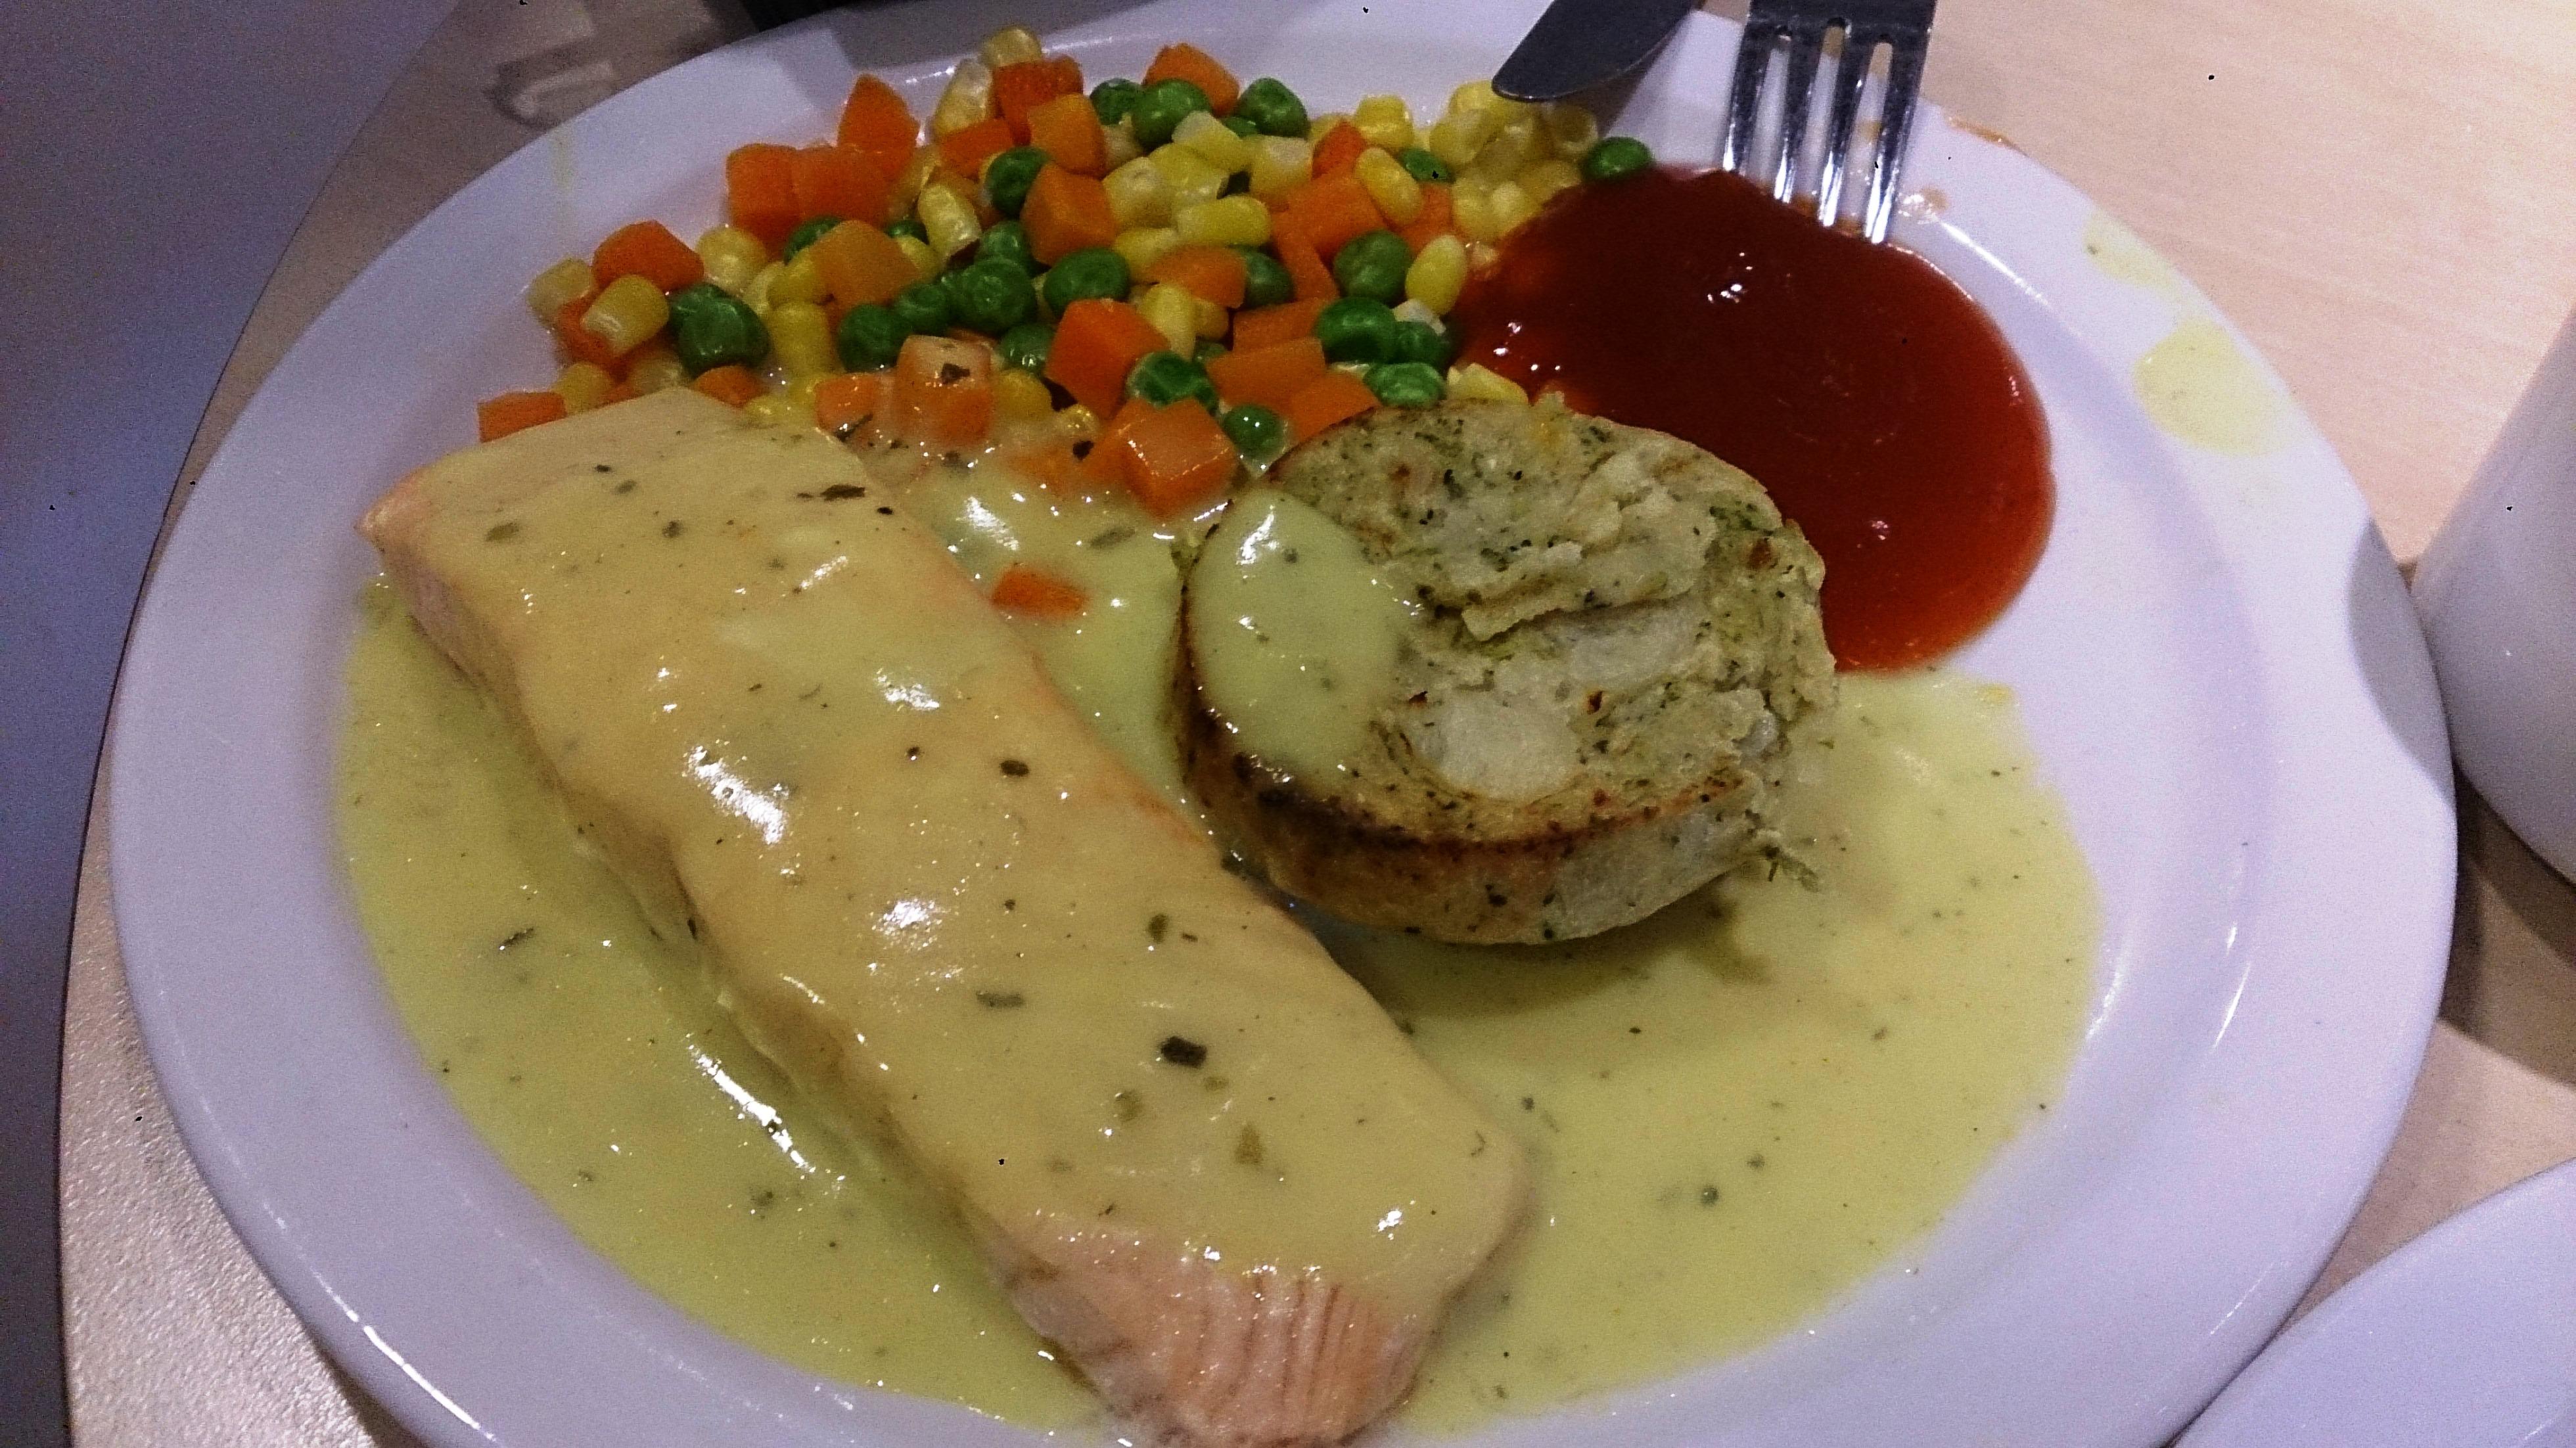 File:Poached salmon.jpg - Wikimedia Commons